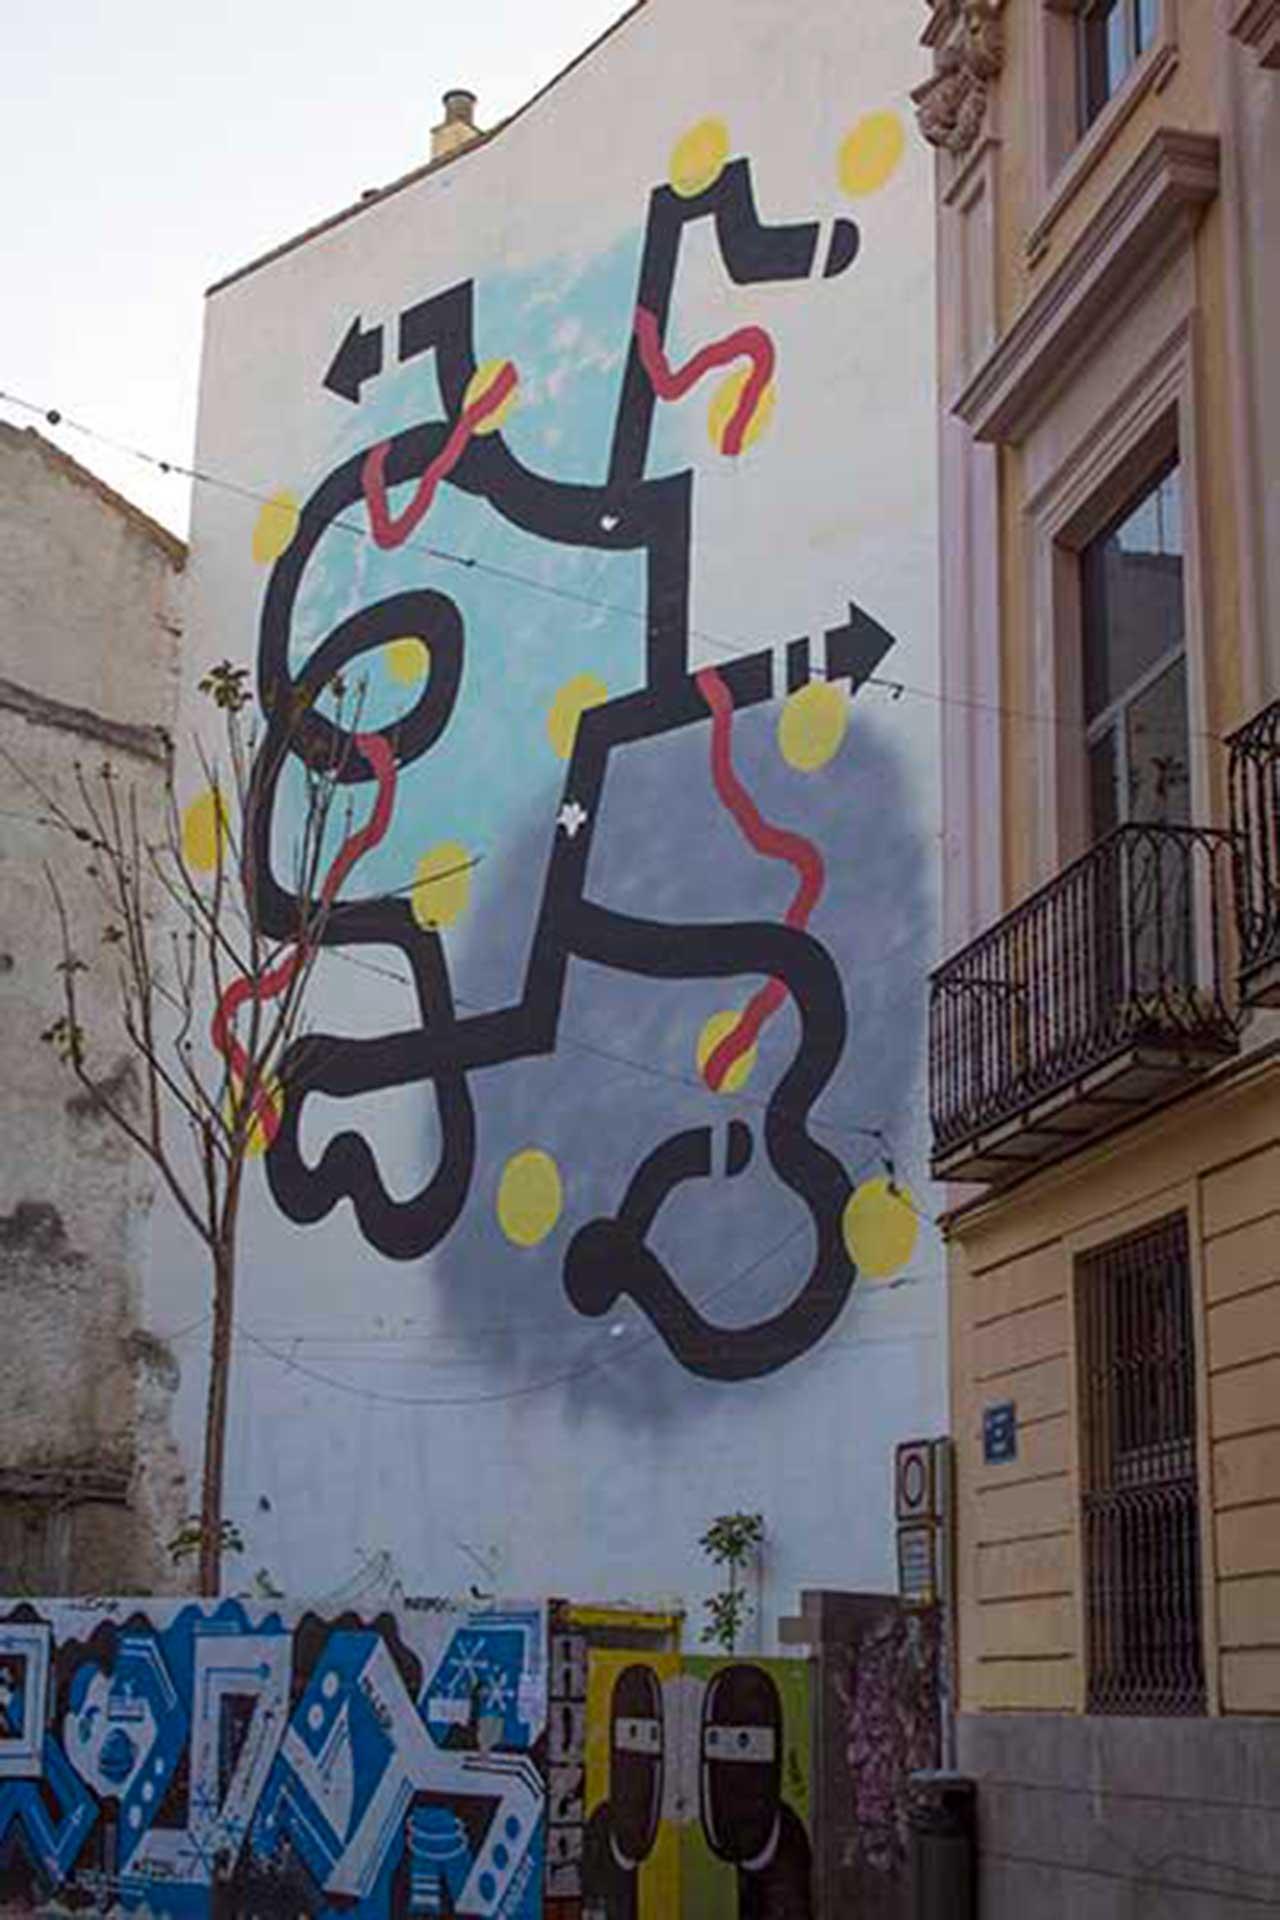 Spagna, Valencia, Cituat Vellua